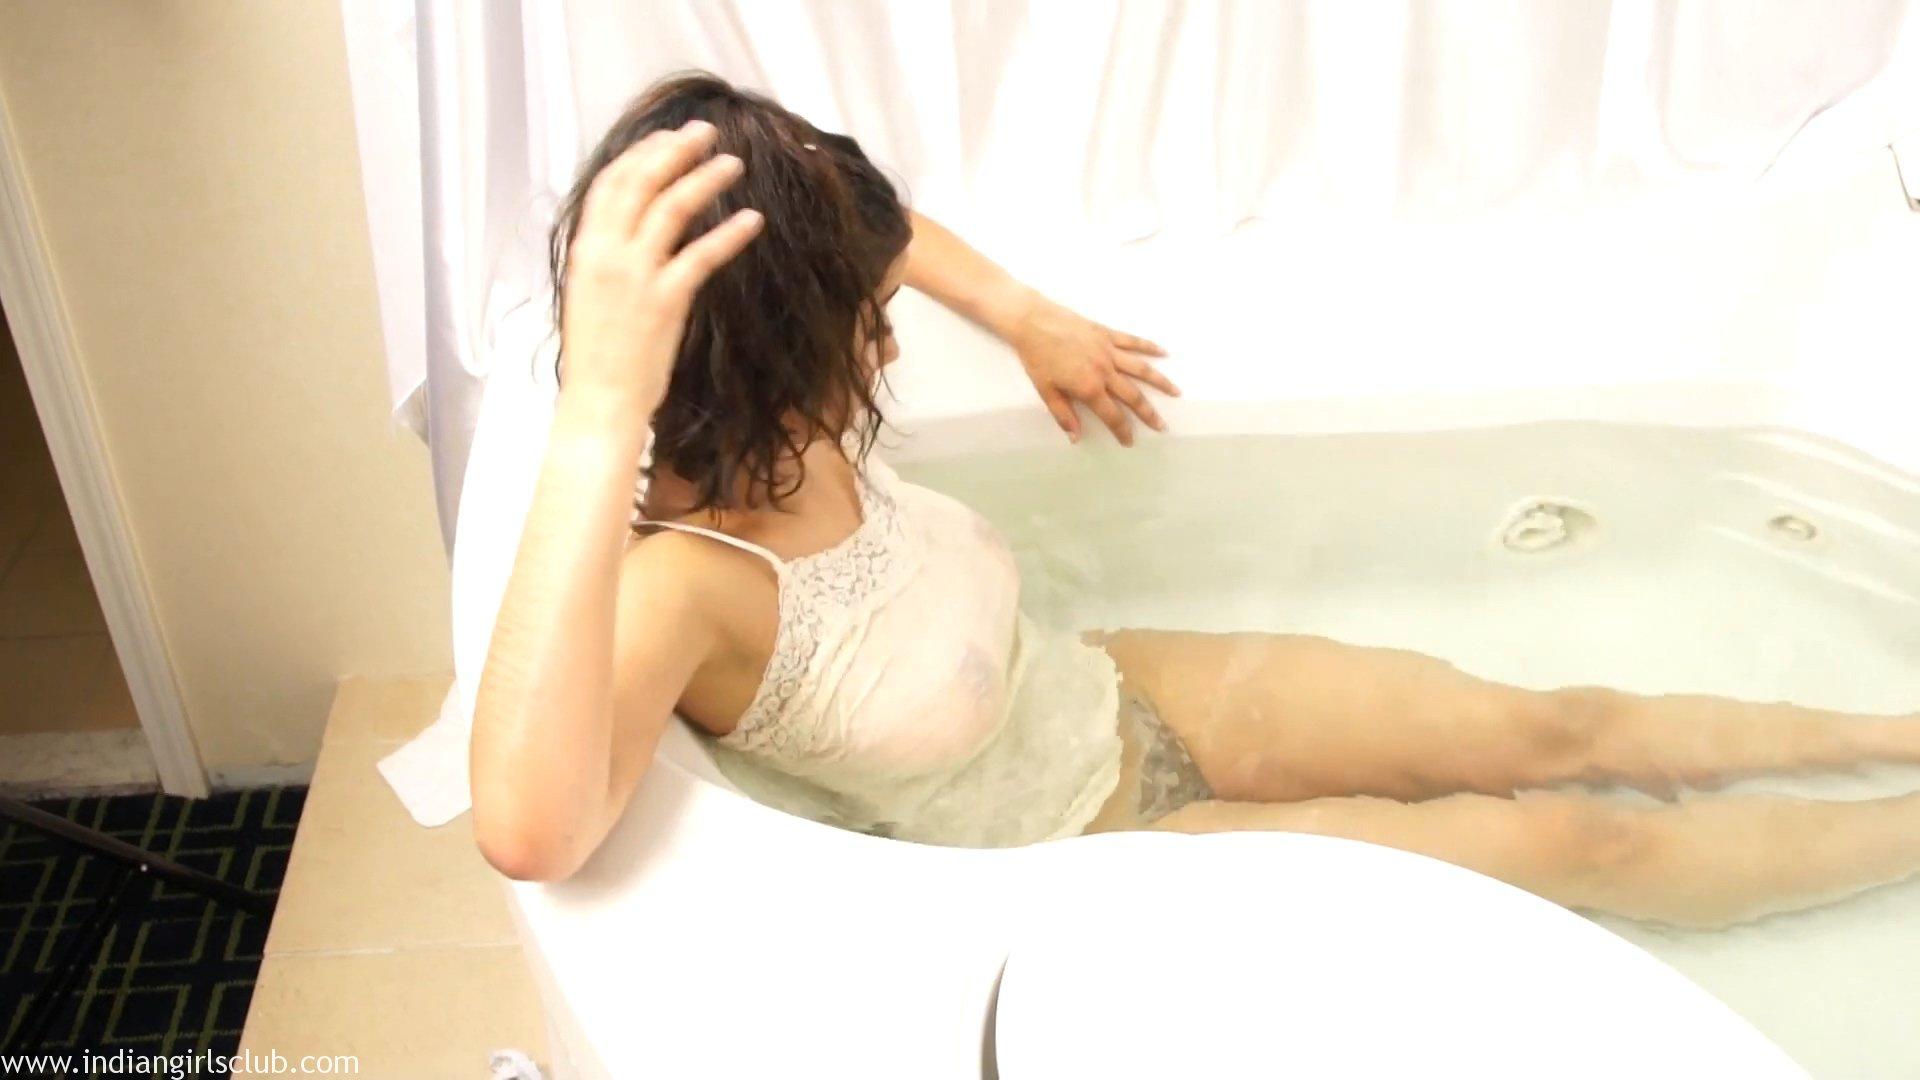 Bollywood Indian Babe Shanaya Nude Sex Photos Indian Girls Club